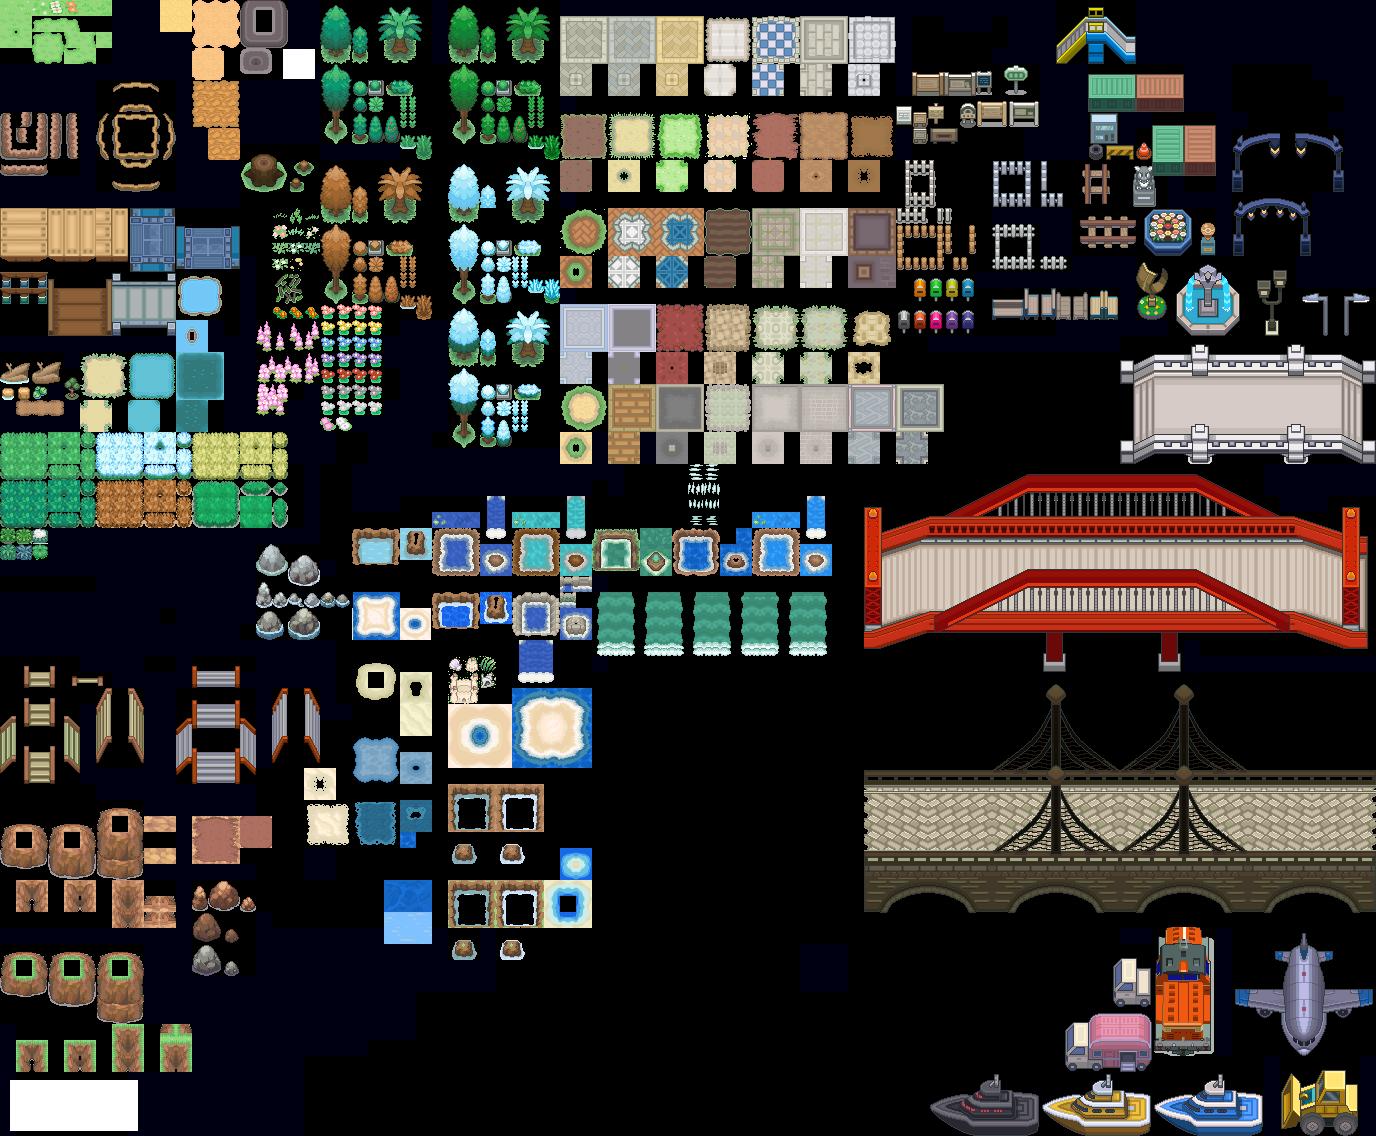 Pokémon-Tileset: Taragonia-BW-MIX / Ultimate Mix Edition 2